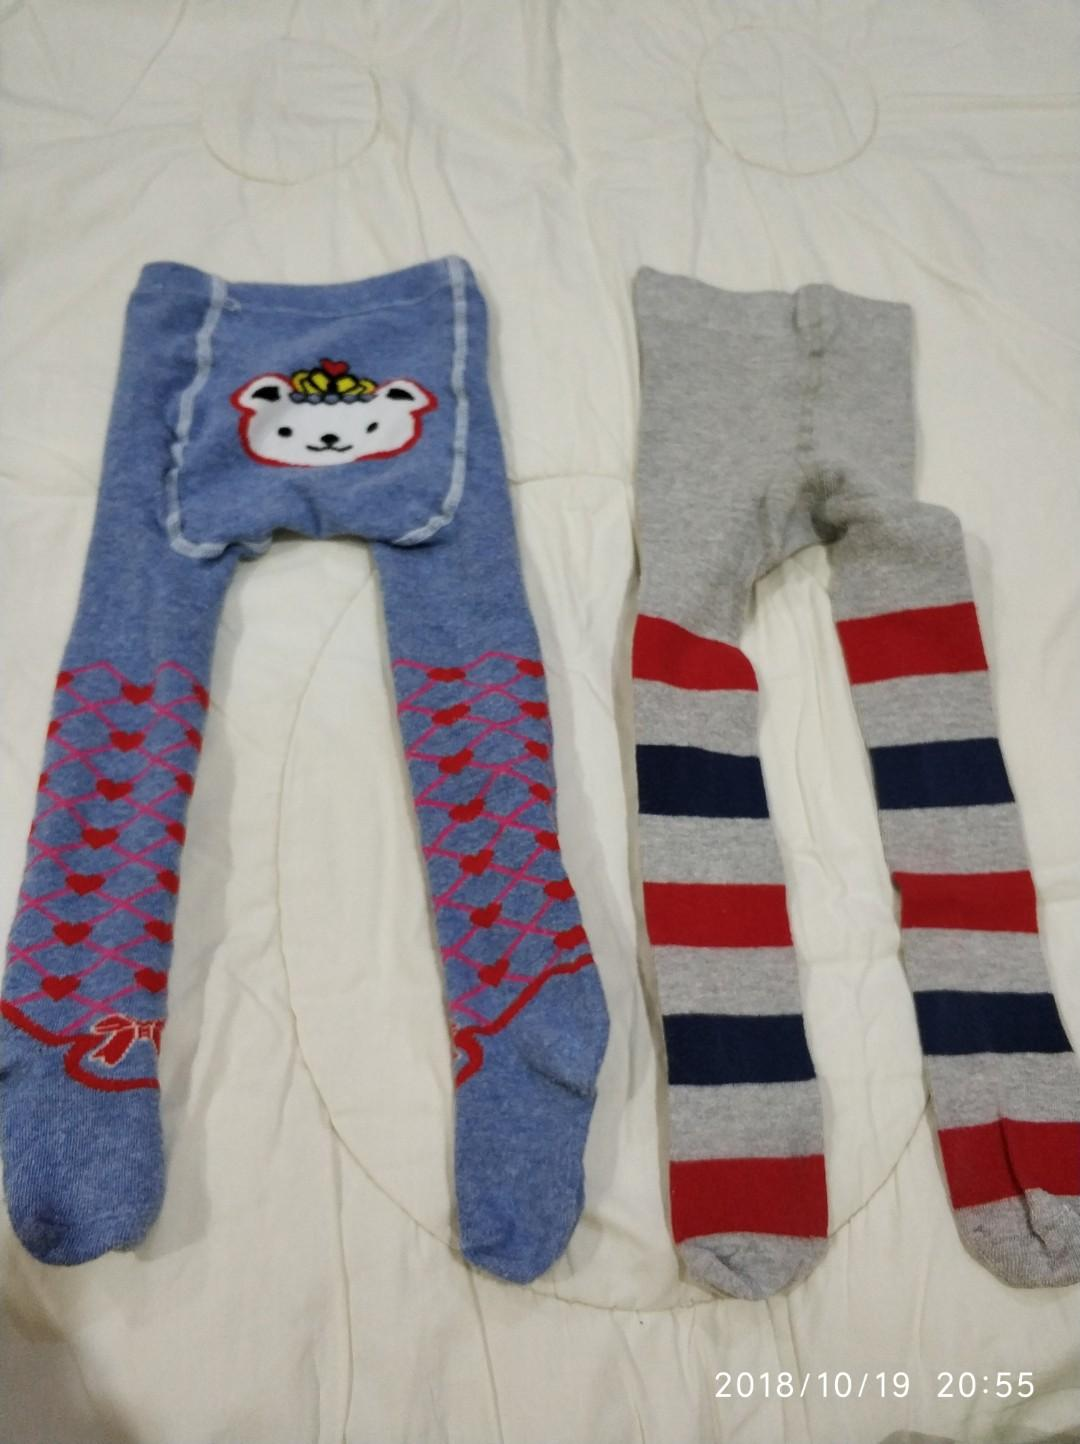 2 Pcs Celana Legging Kaos Kaki Baby Bayi Anak Baju Bayi Di Carousell